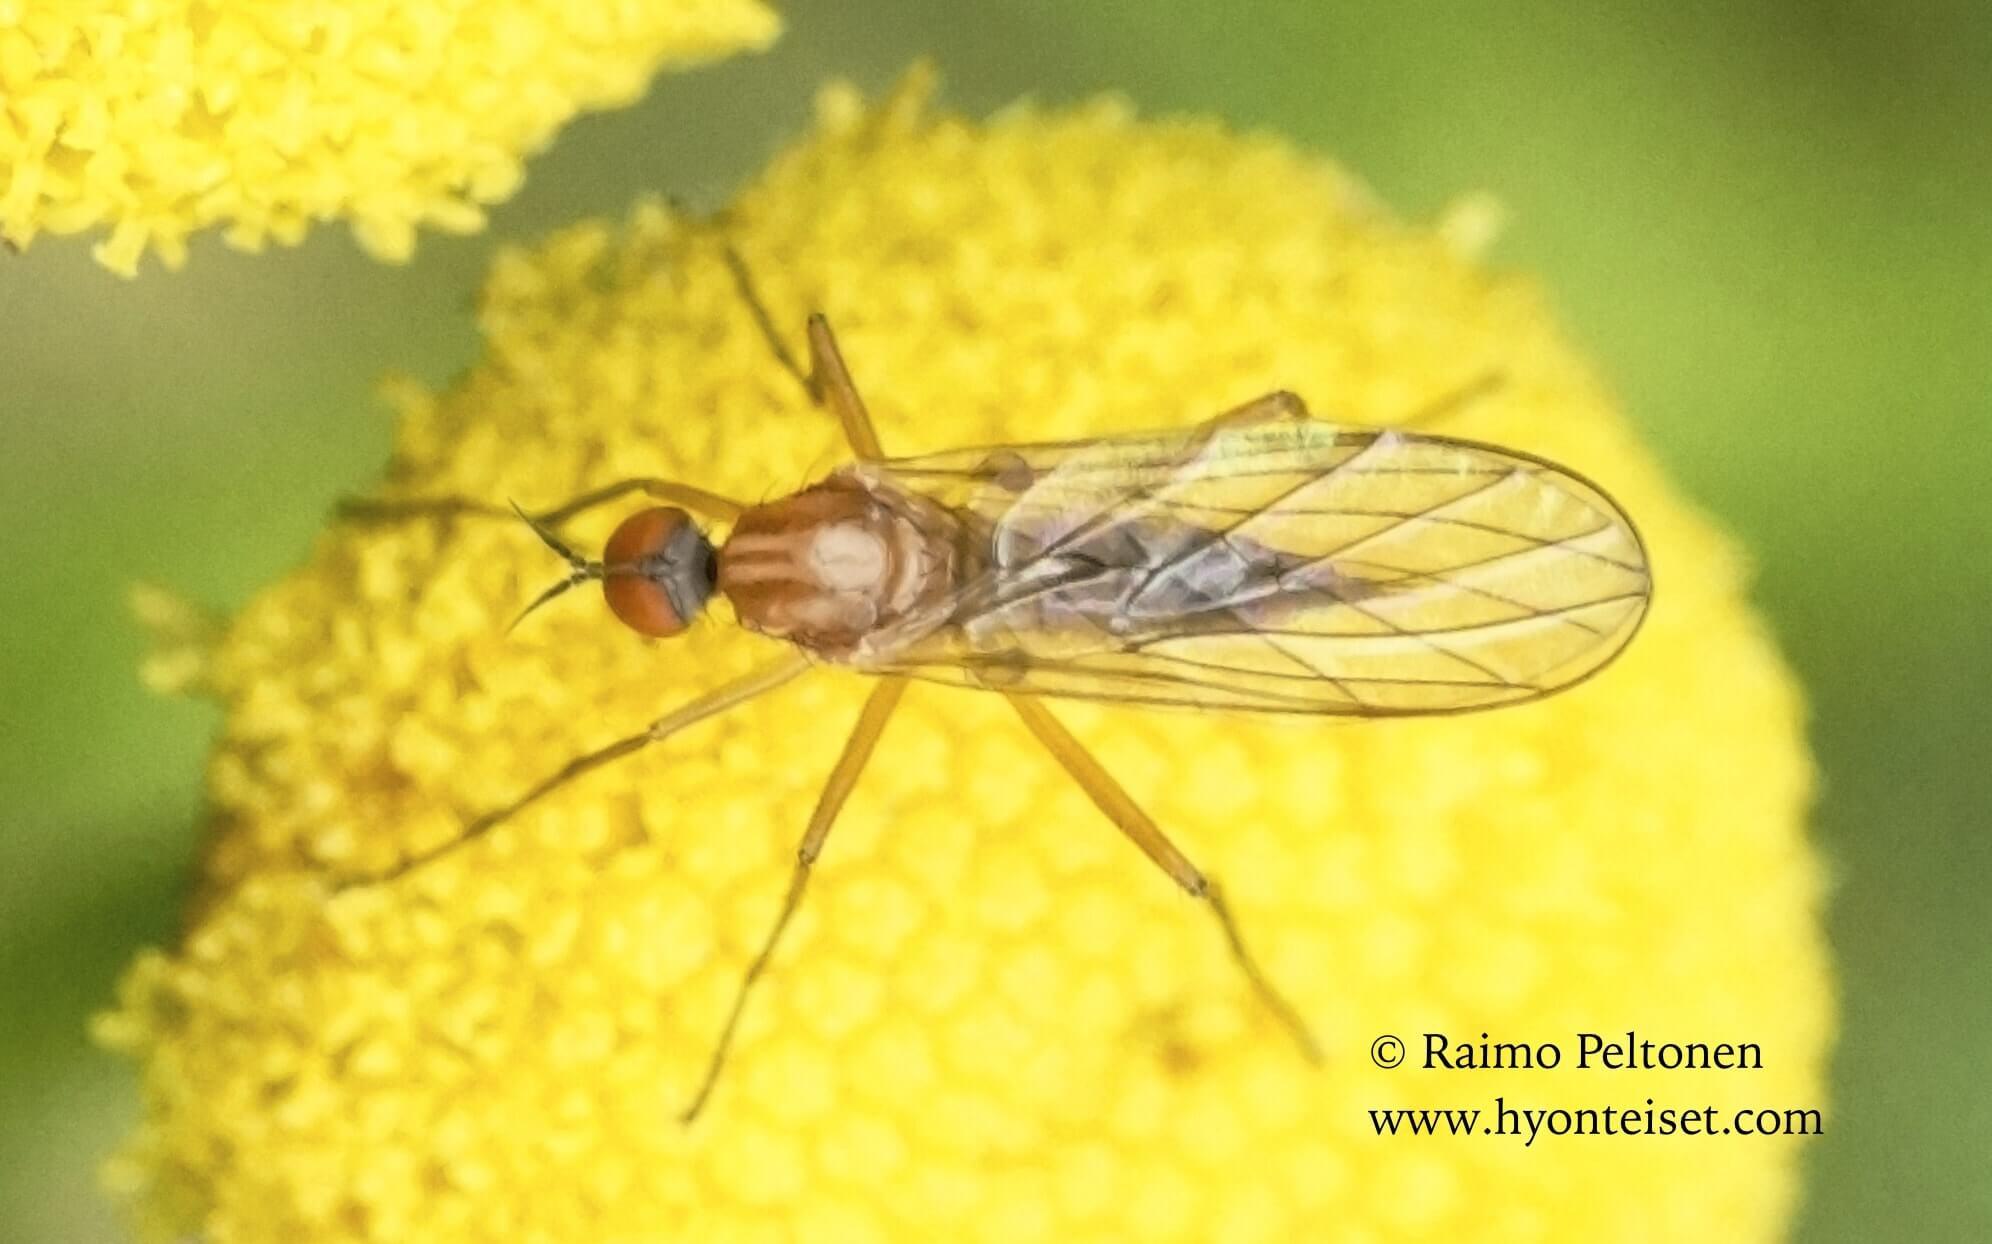 Rhamphomyia cf. variabilis (det. Paul Beuk), 17.6.2015 Jyväskylä